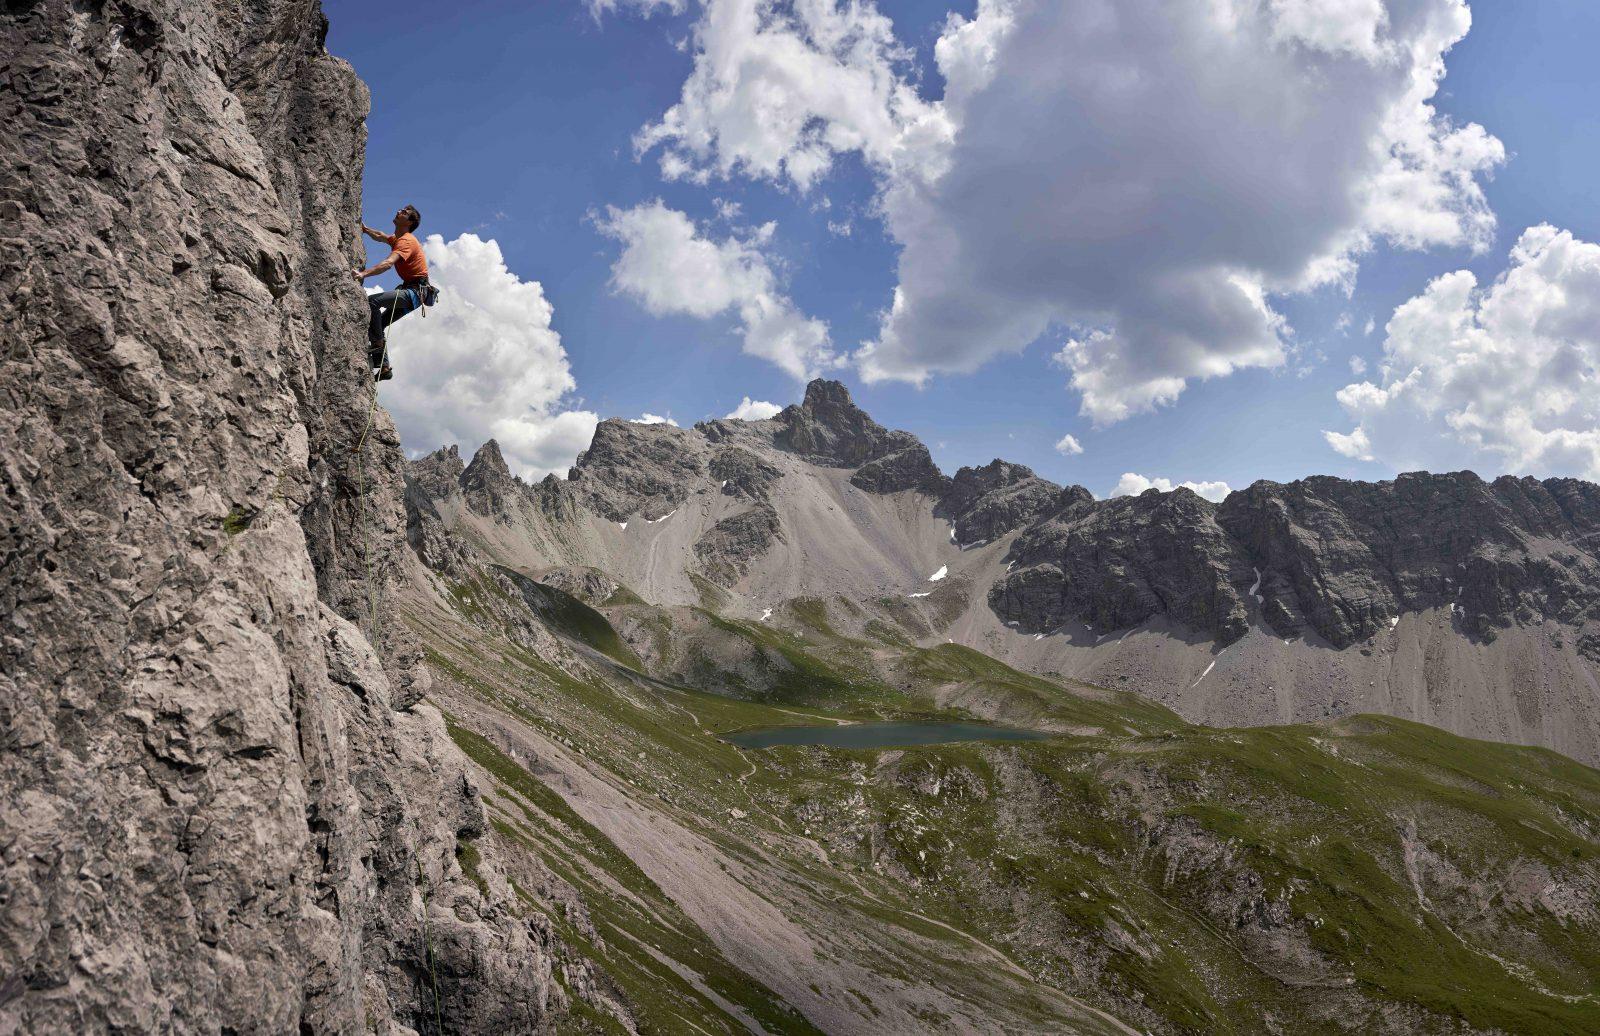 Klettern Tiroler Zugspitz Arena @ Michael Meisl I Climbers Paradise